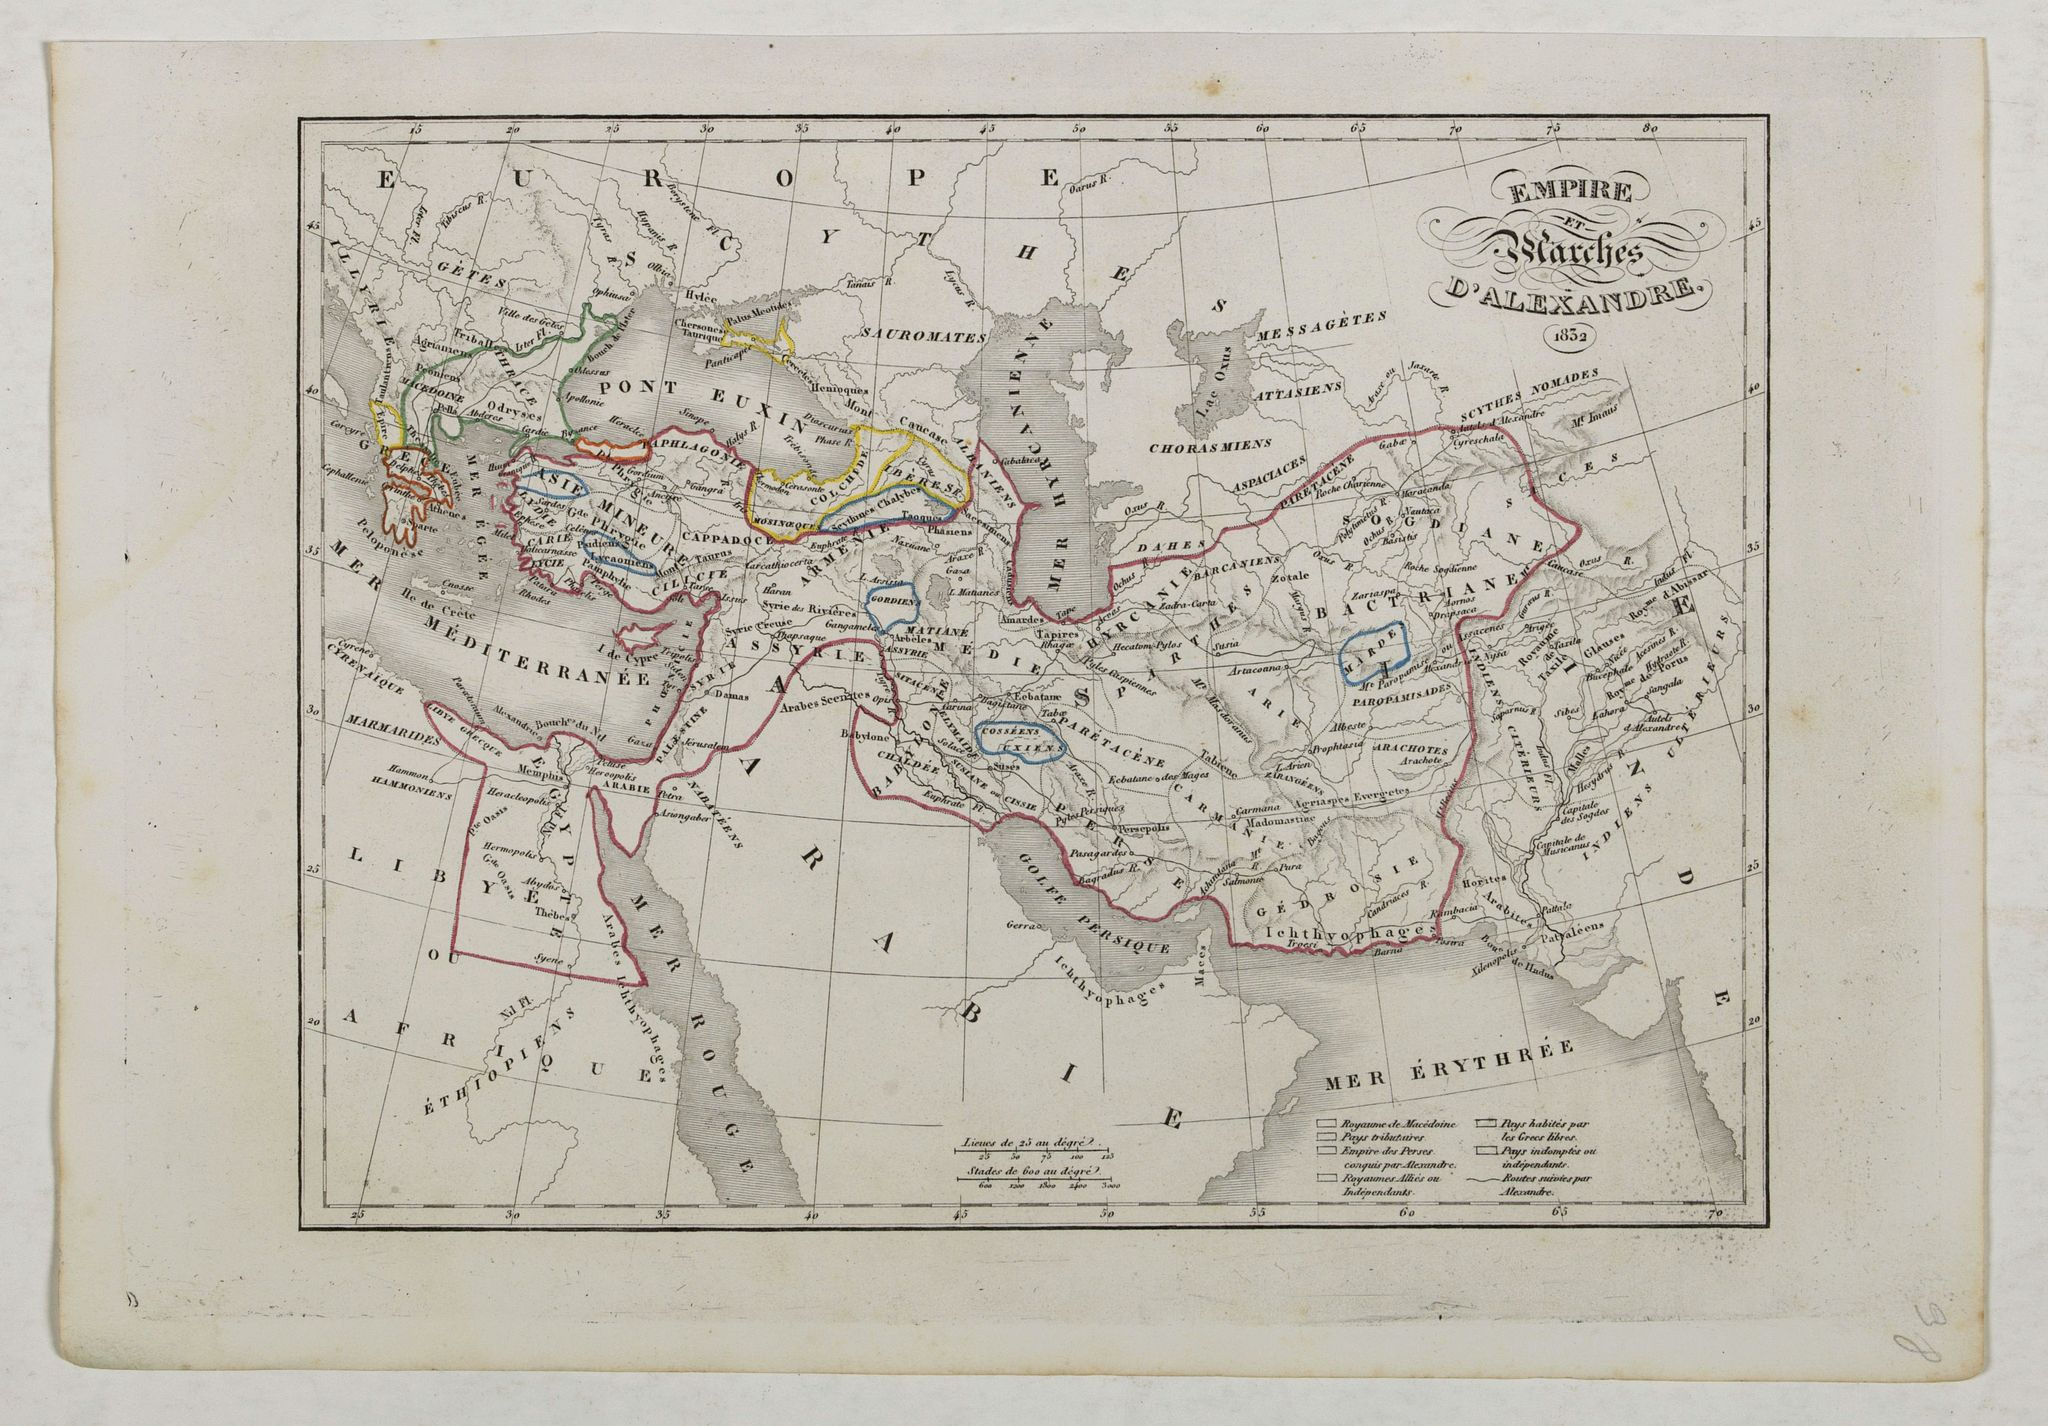 MONIN, C.V. -  Empire et Marches D'Alexandrie.